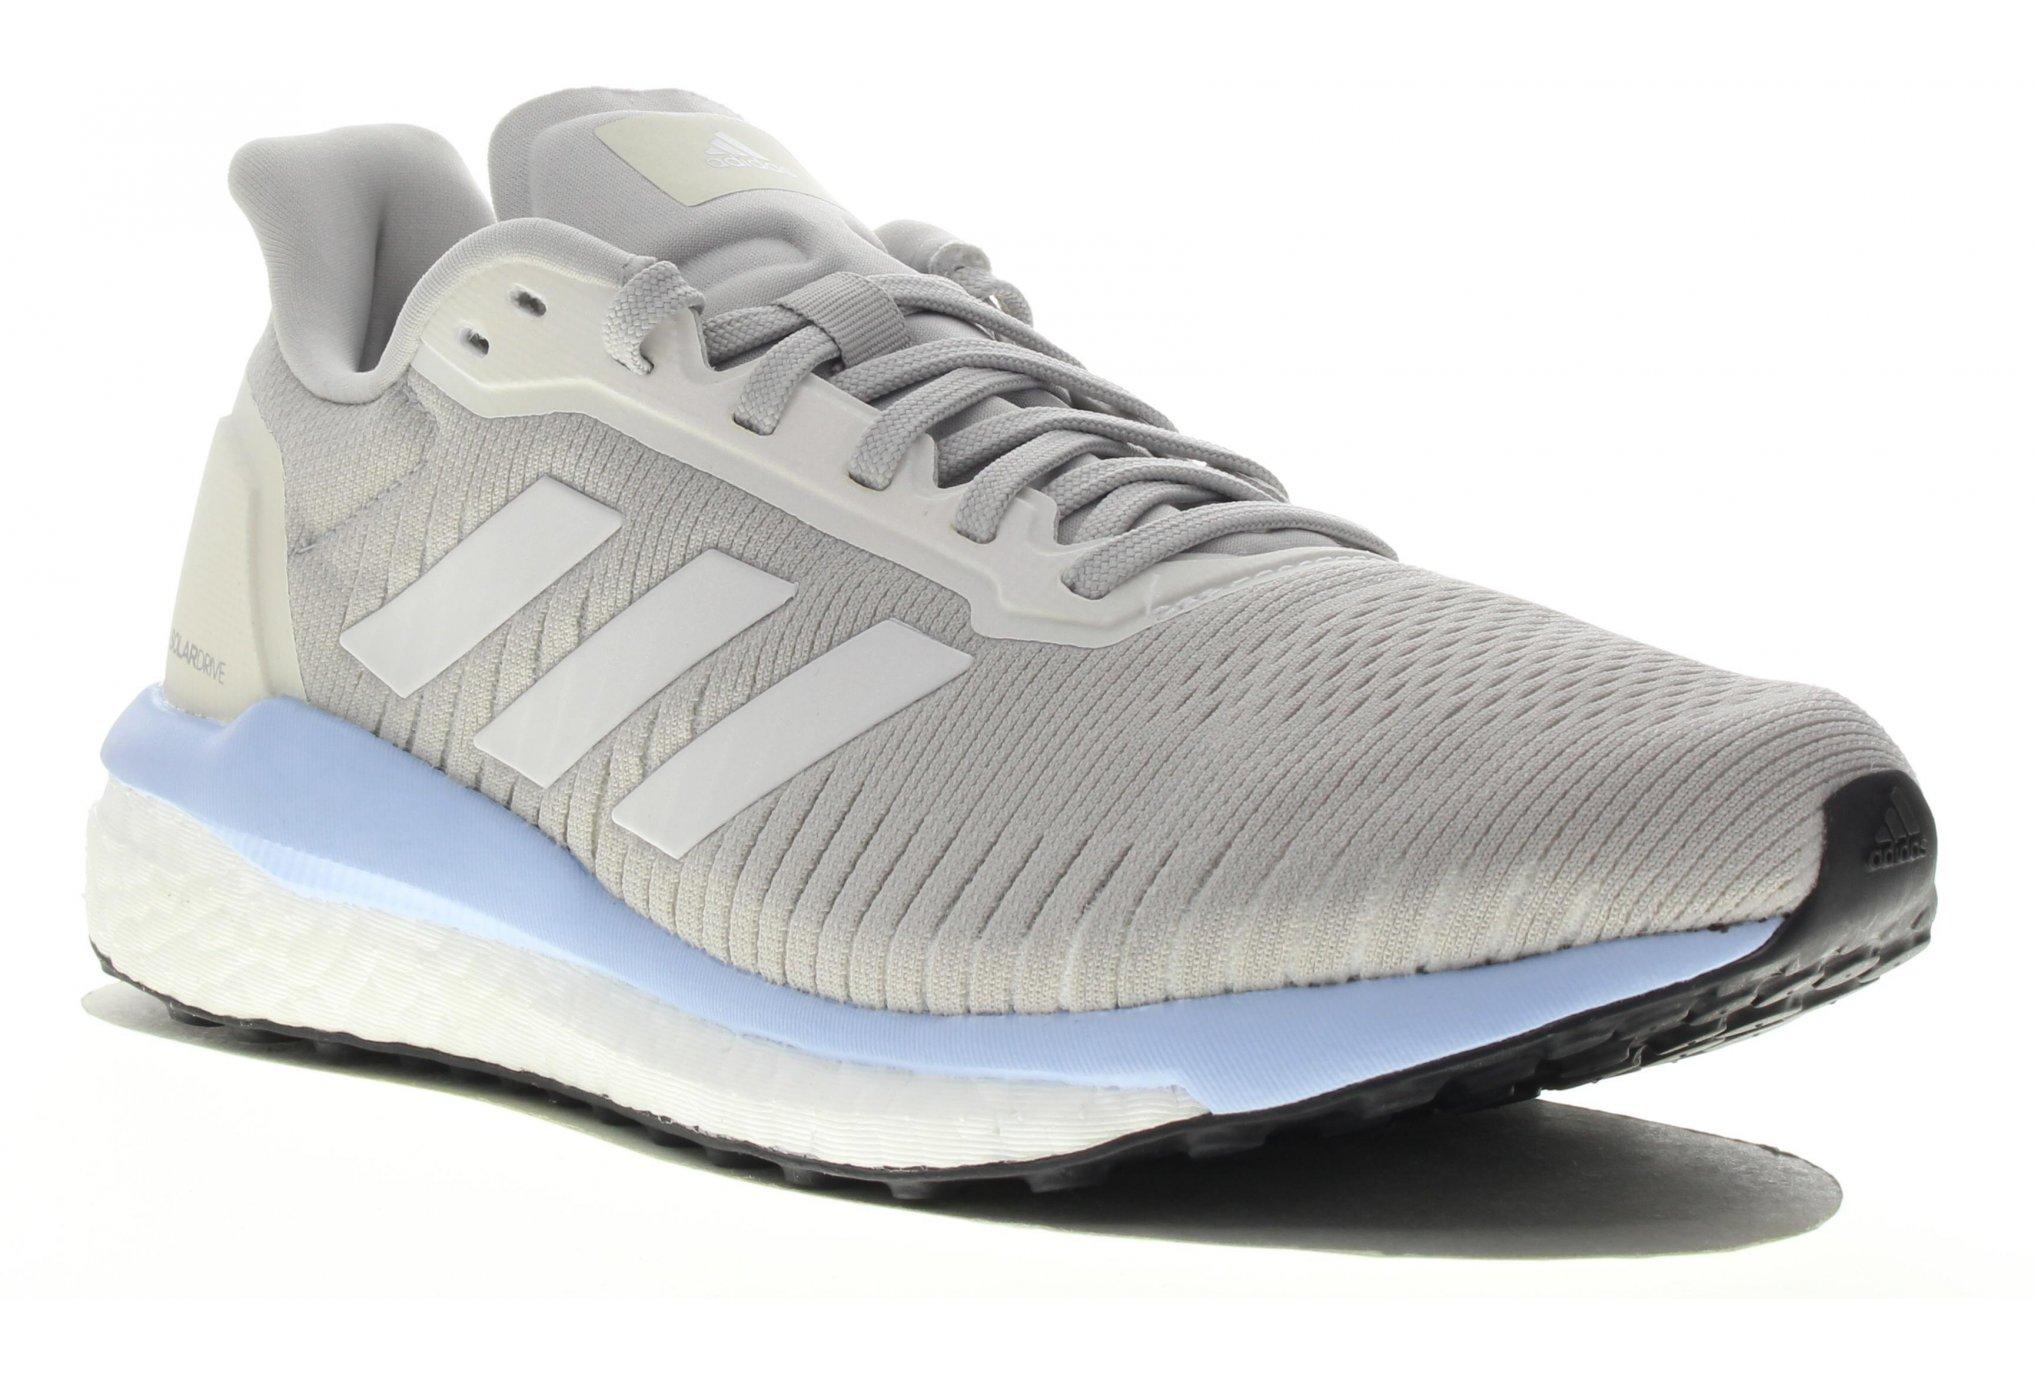 adidas Solar Drive 19 Reflective Chaussures running femme